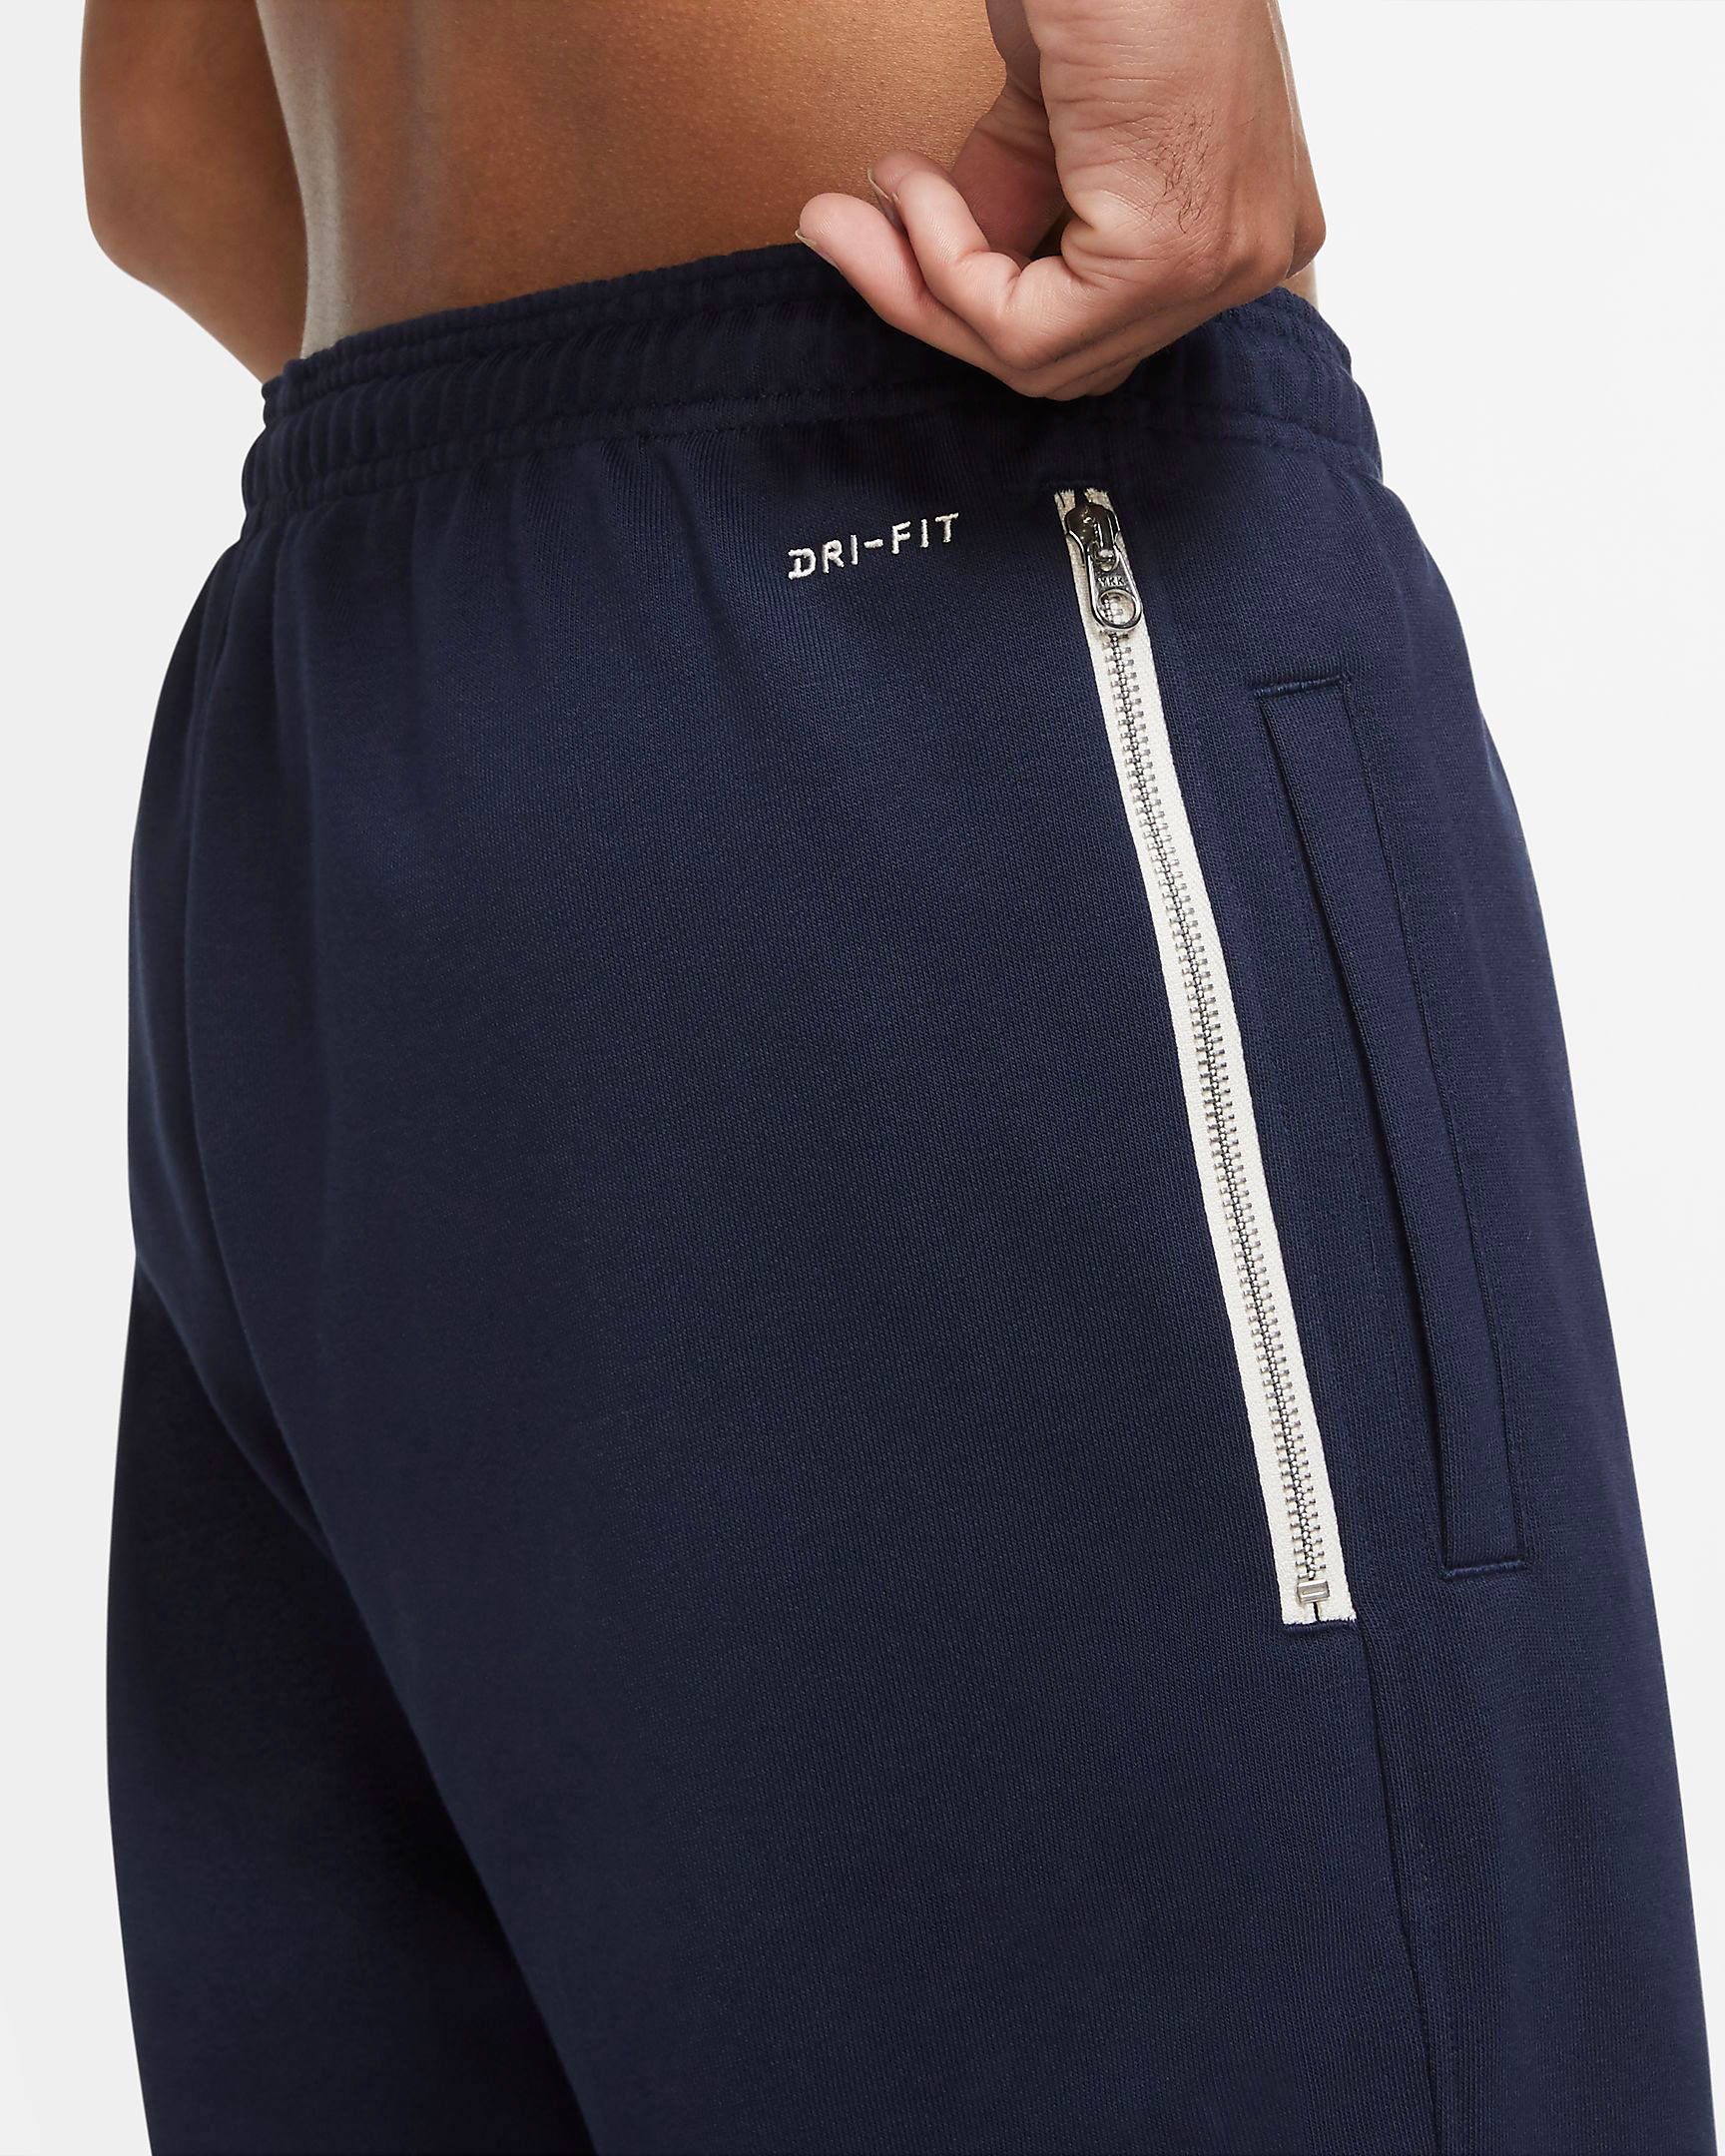 nike-lebron-17-graffiti-cold-blue-basketball-pants-2